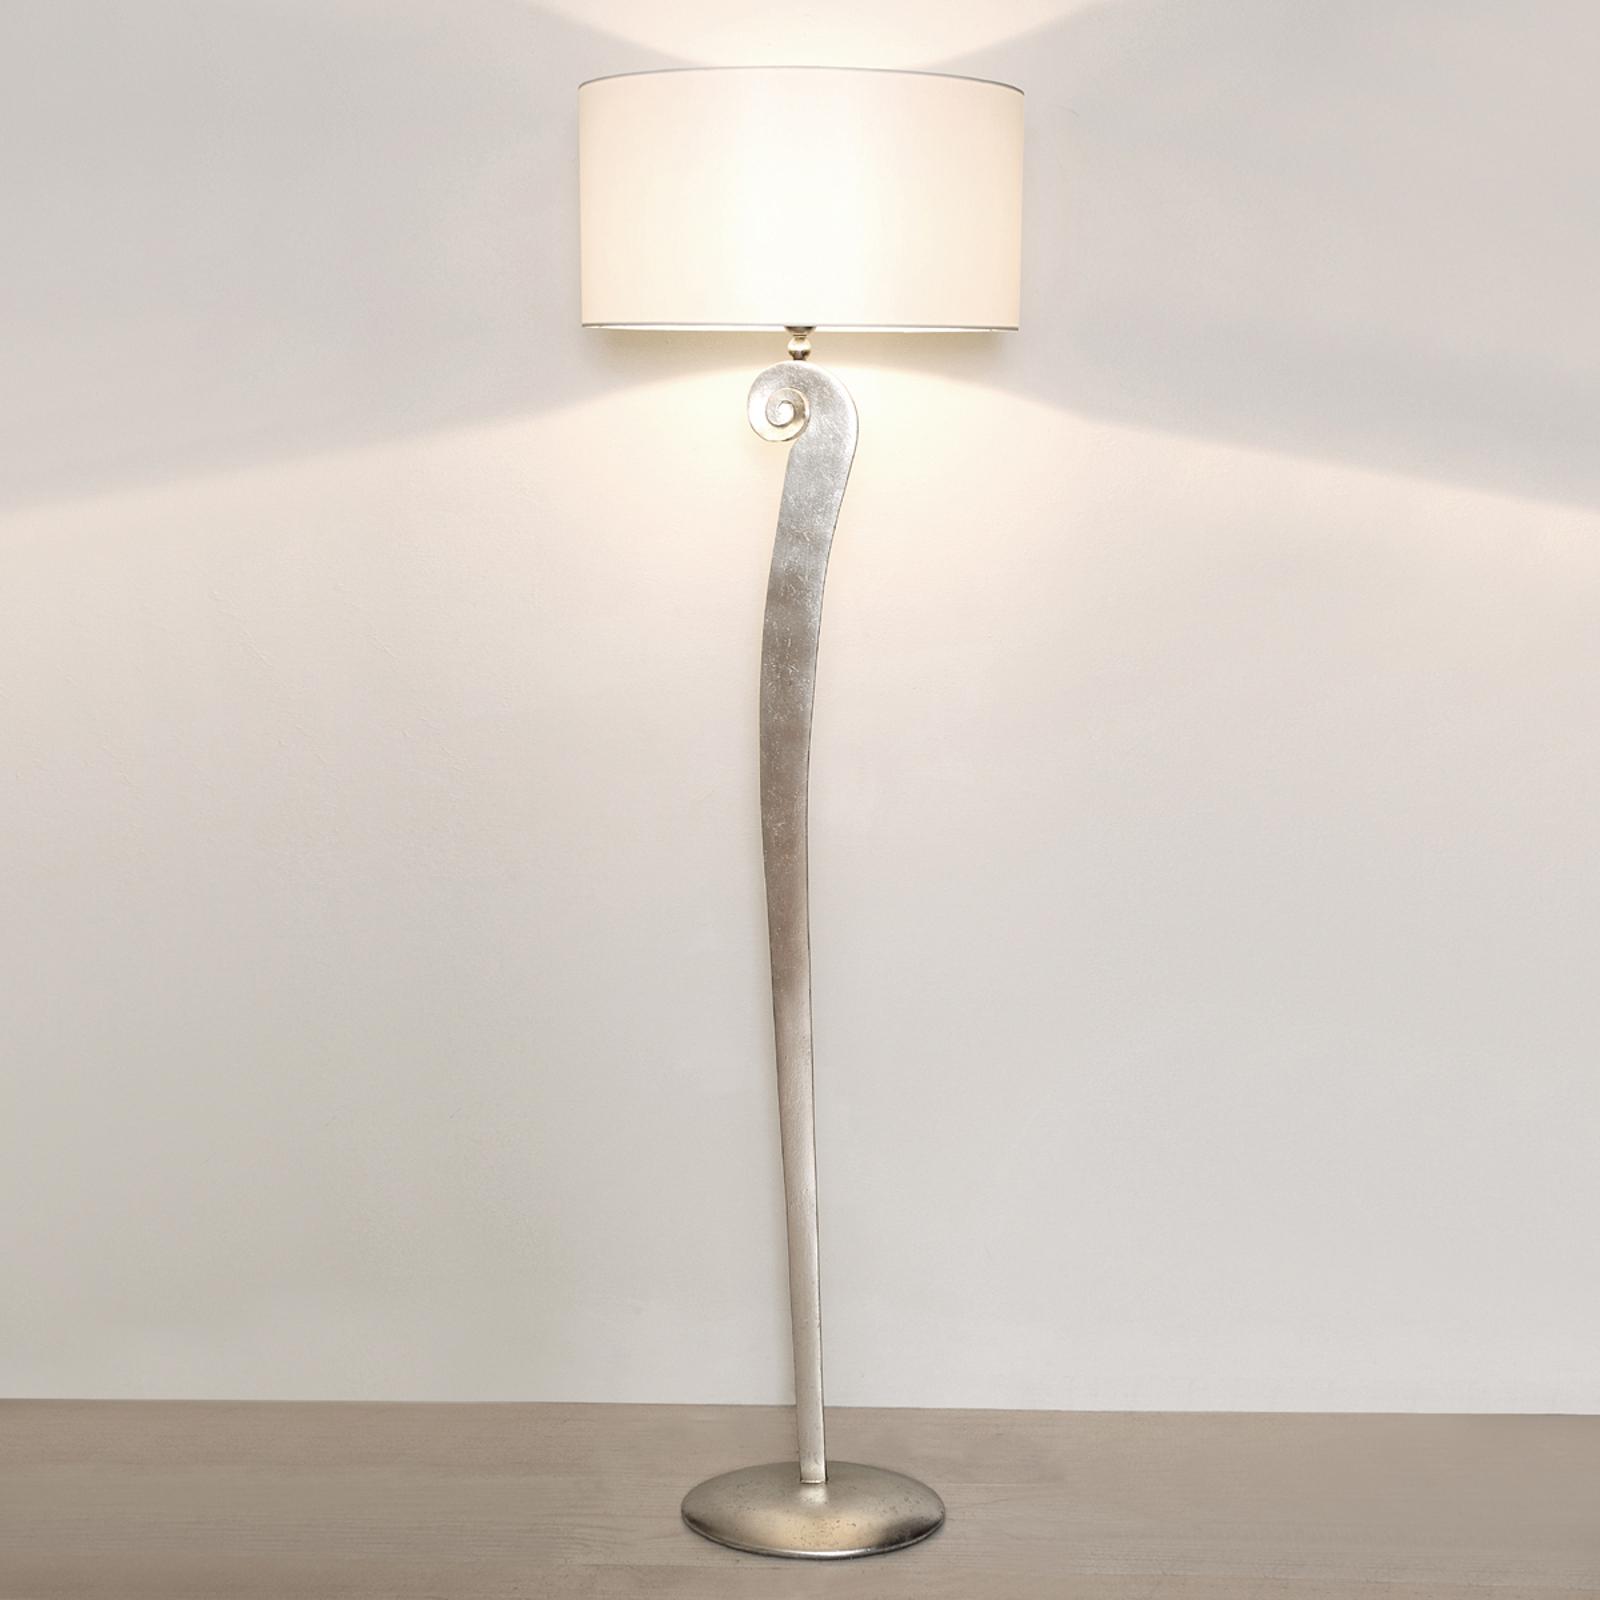 Stilfull golvlampa Lino